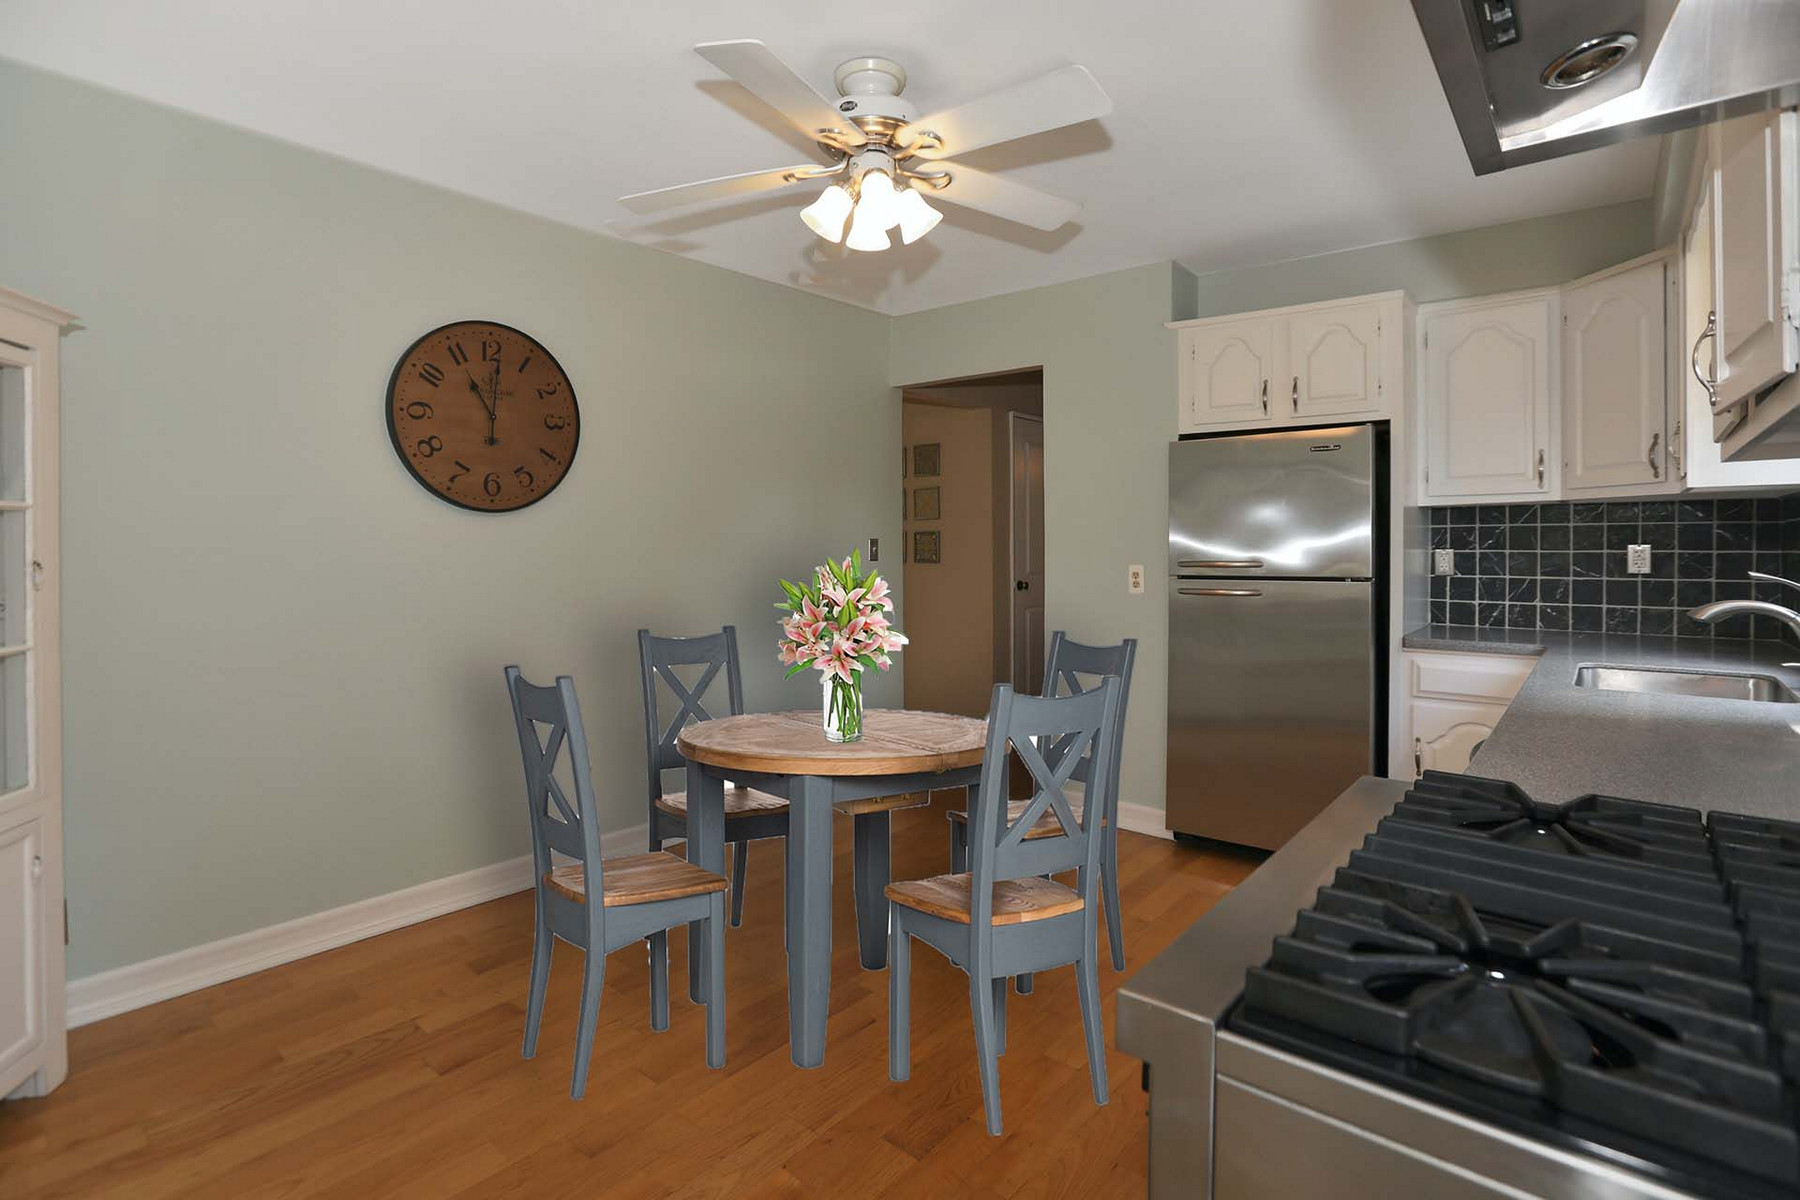 Single Family Homes для того Продажа на Adorable Gem! 77 Knickerbocker Ave, Hillsdale, Нью-Джерси 07642 Соединенные Штаты